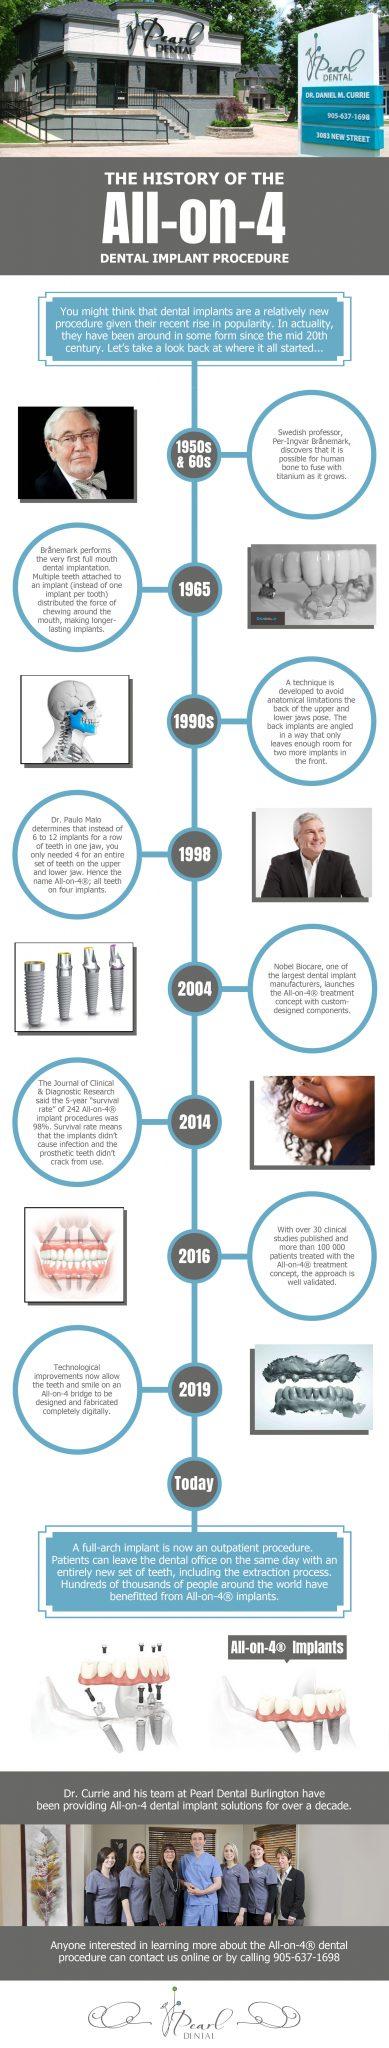 All-on-4-Dental-implants in Burlington